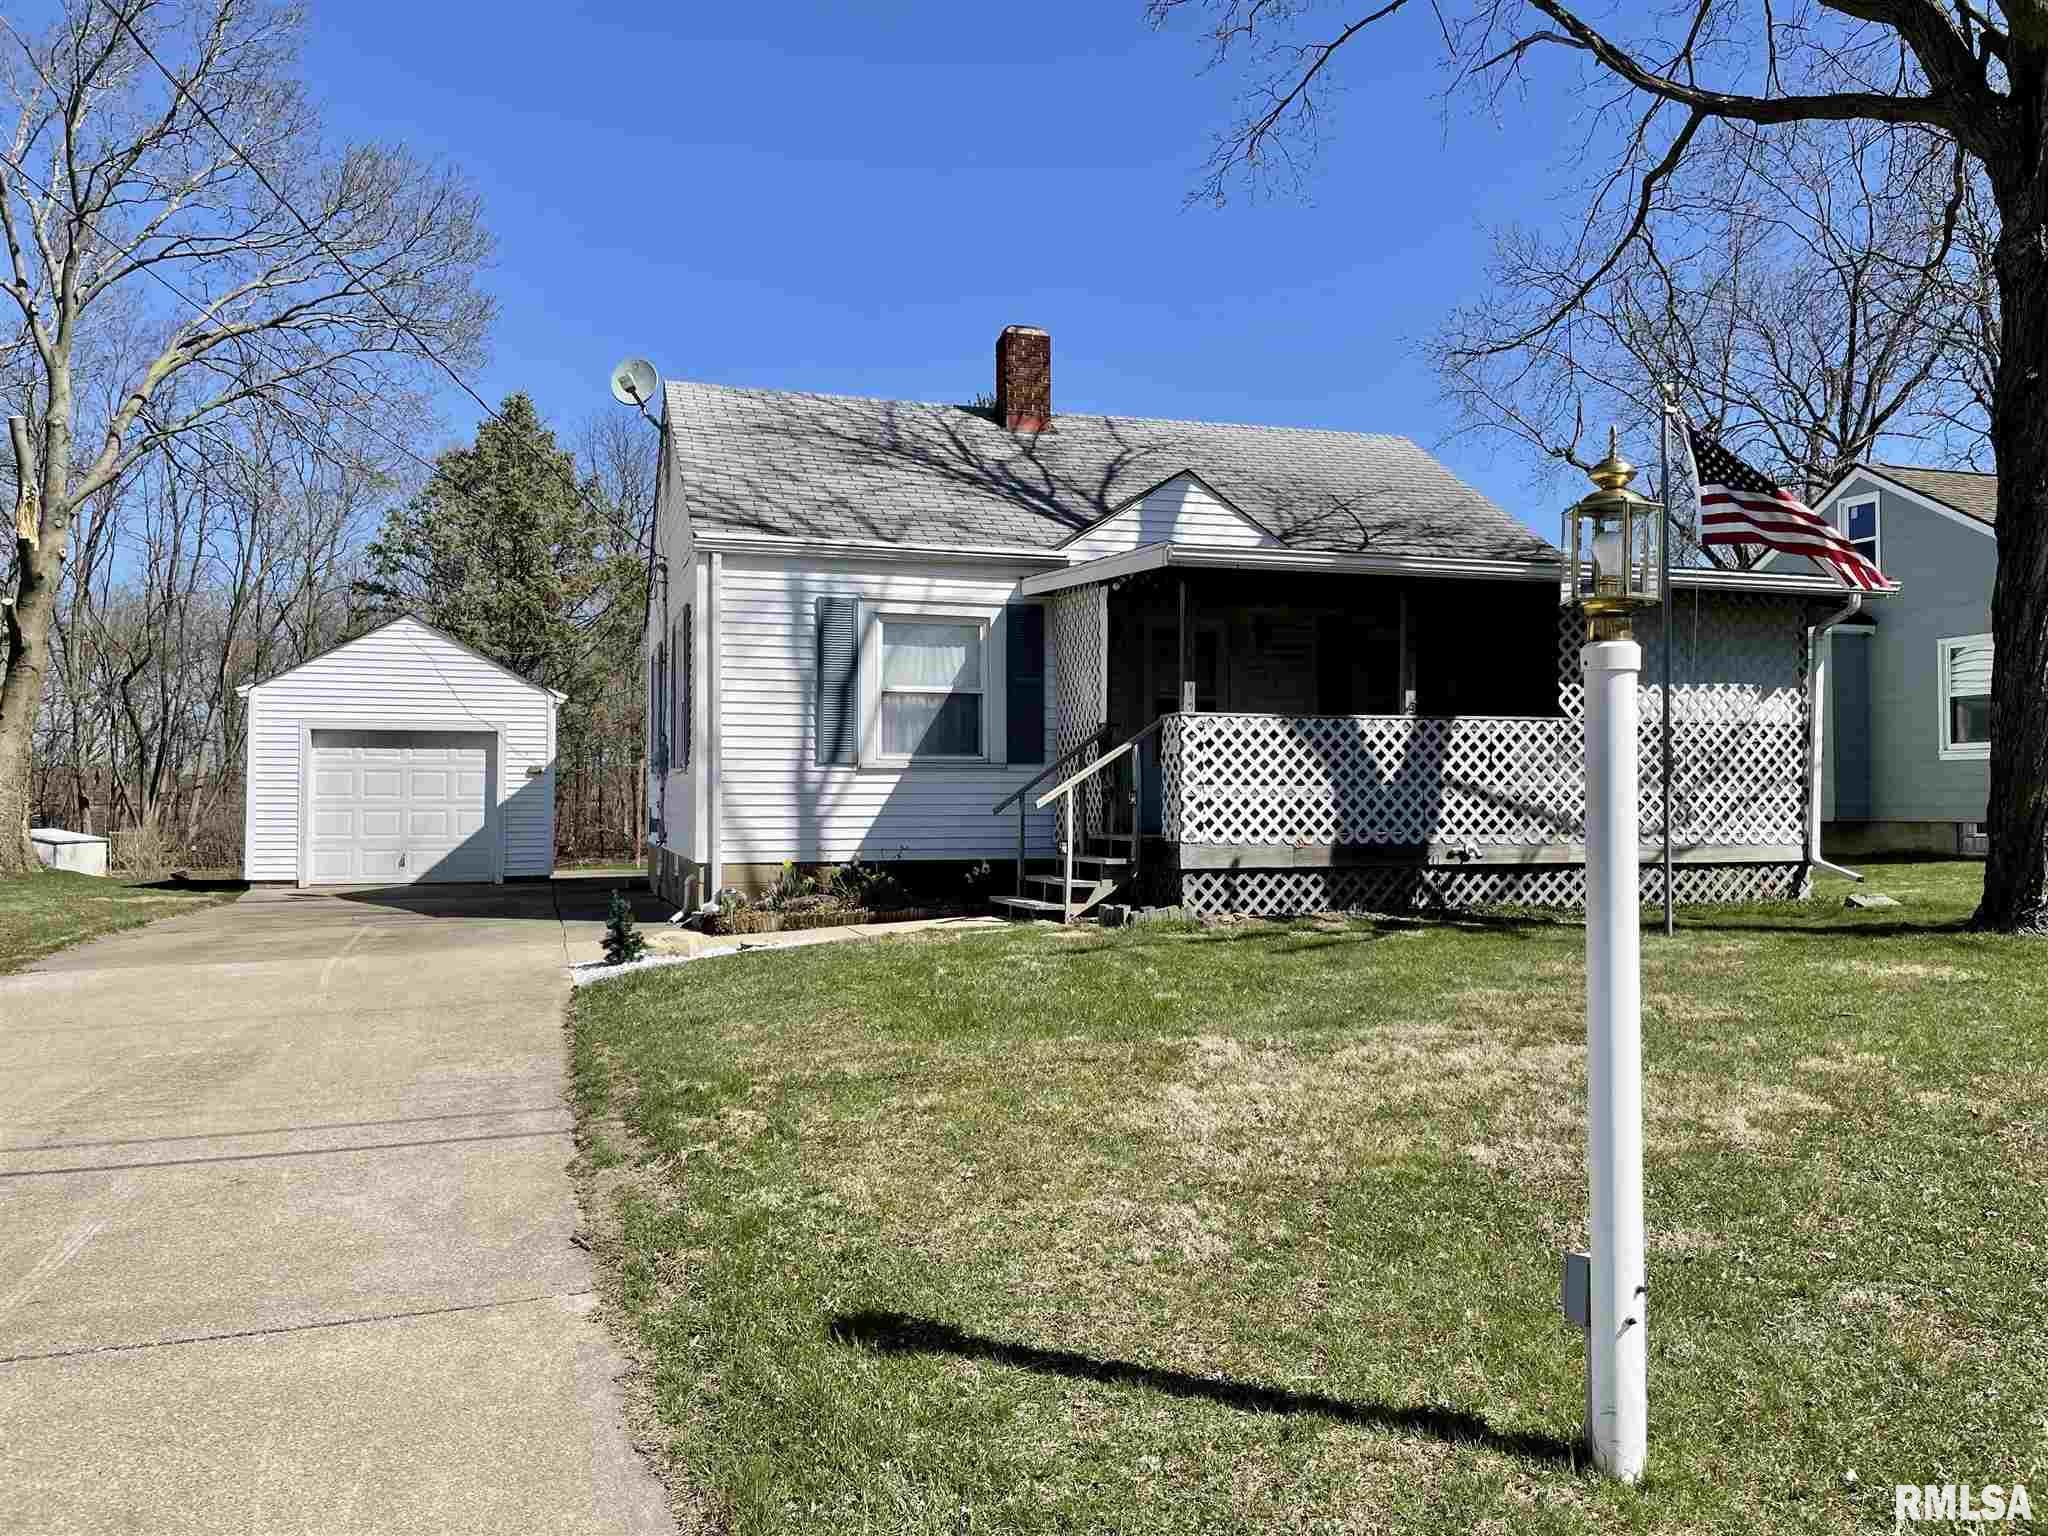 519 SUNSET Property Photo - Eureka, IL real estate listing